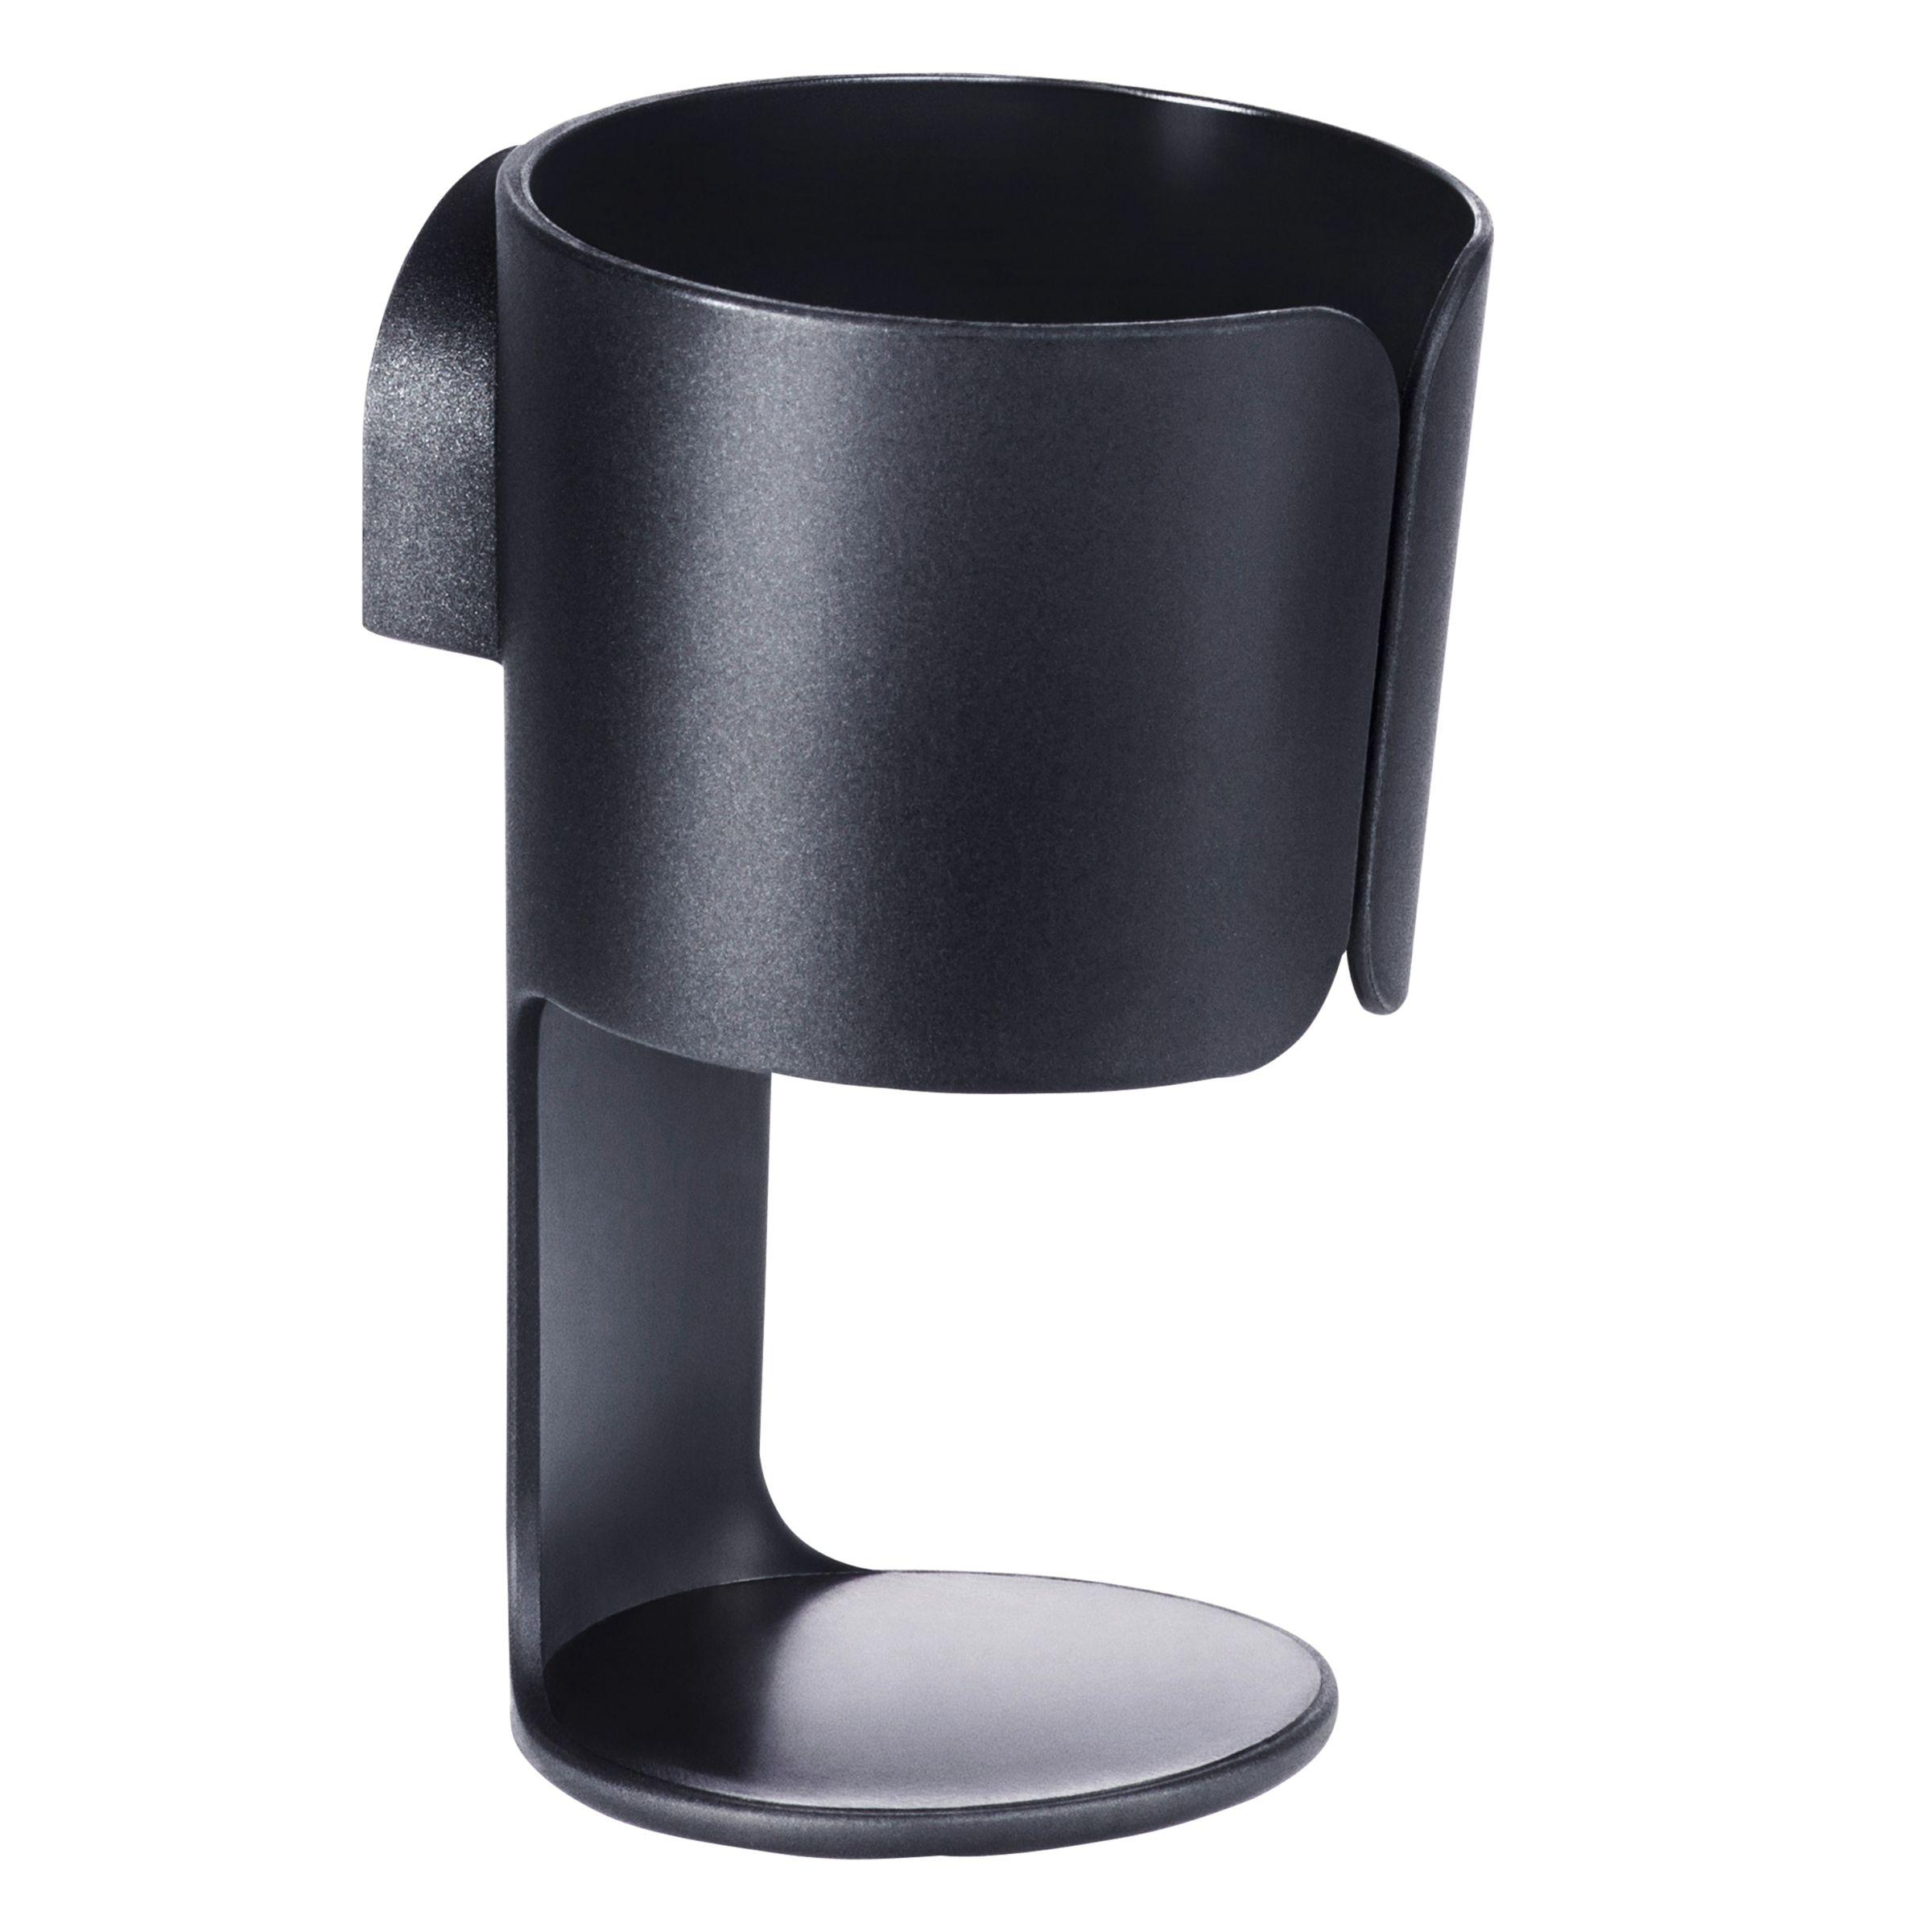 Cybex Cybex Priam Cup Holder, Black